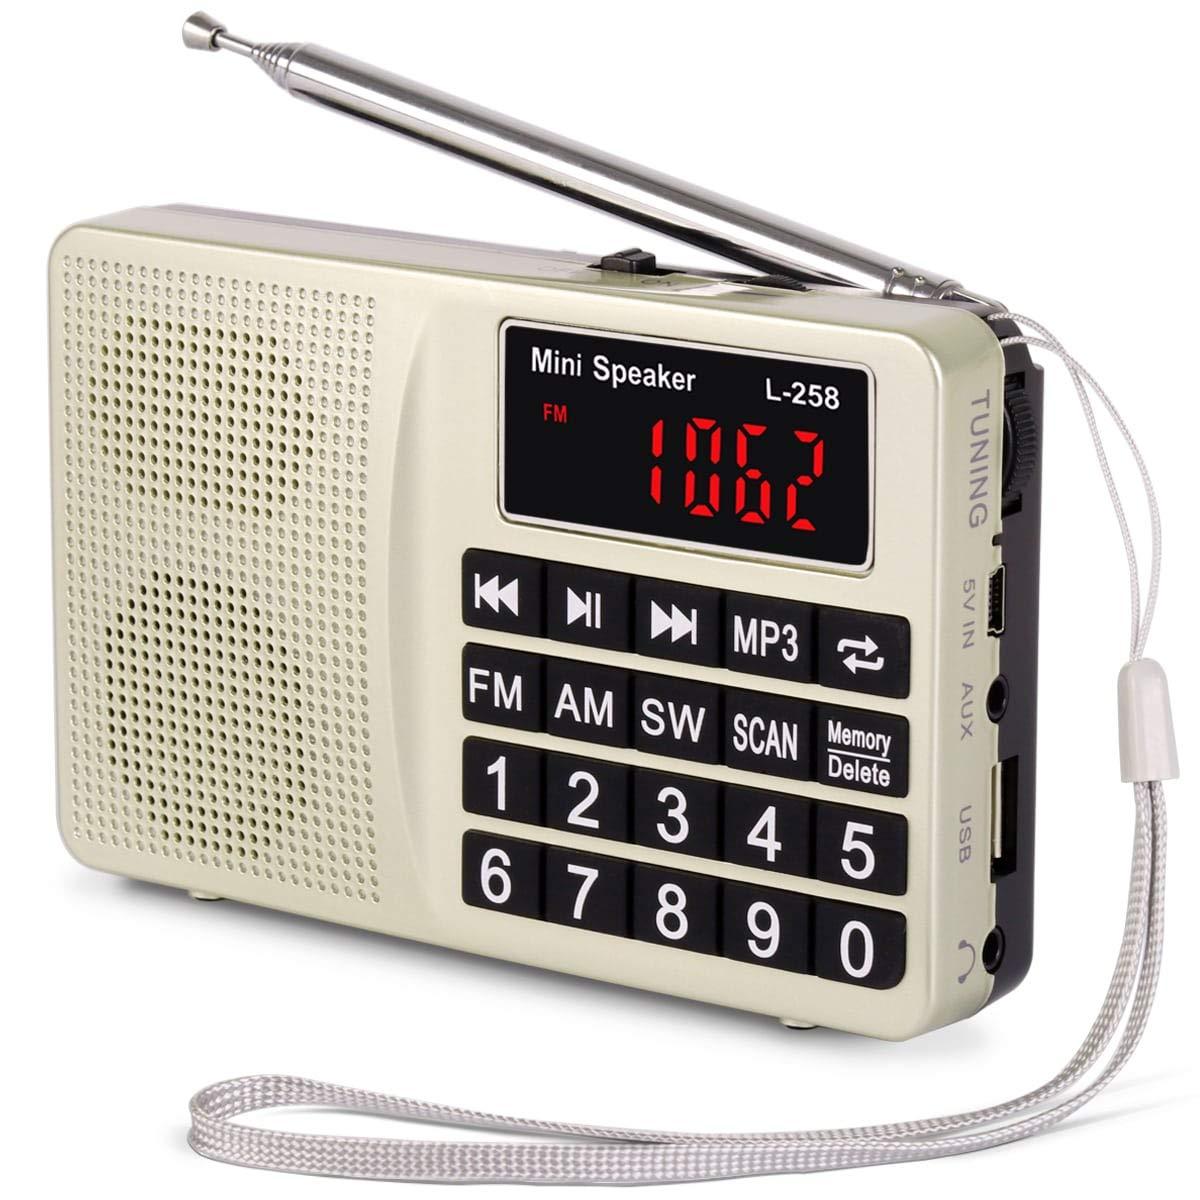 Prunus L-258SW Radio portatile Sw/FM/Am(MW)/SD/TF/USB(0-64 GB) MP3 con altoparlante(Ojo: No se Puede memorizar Las emisoras manualmente)